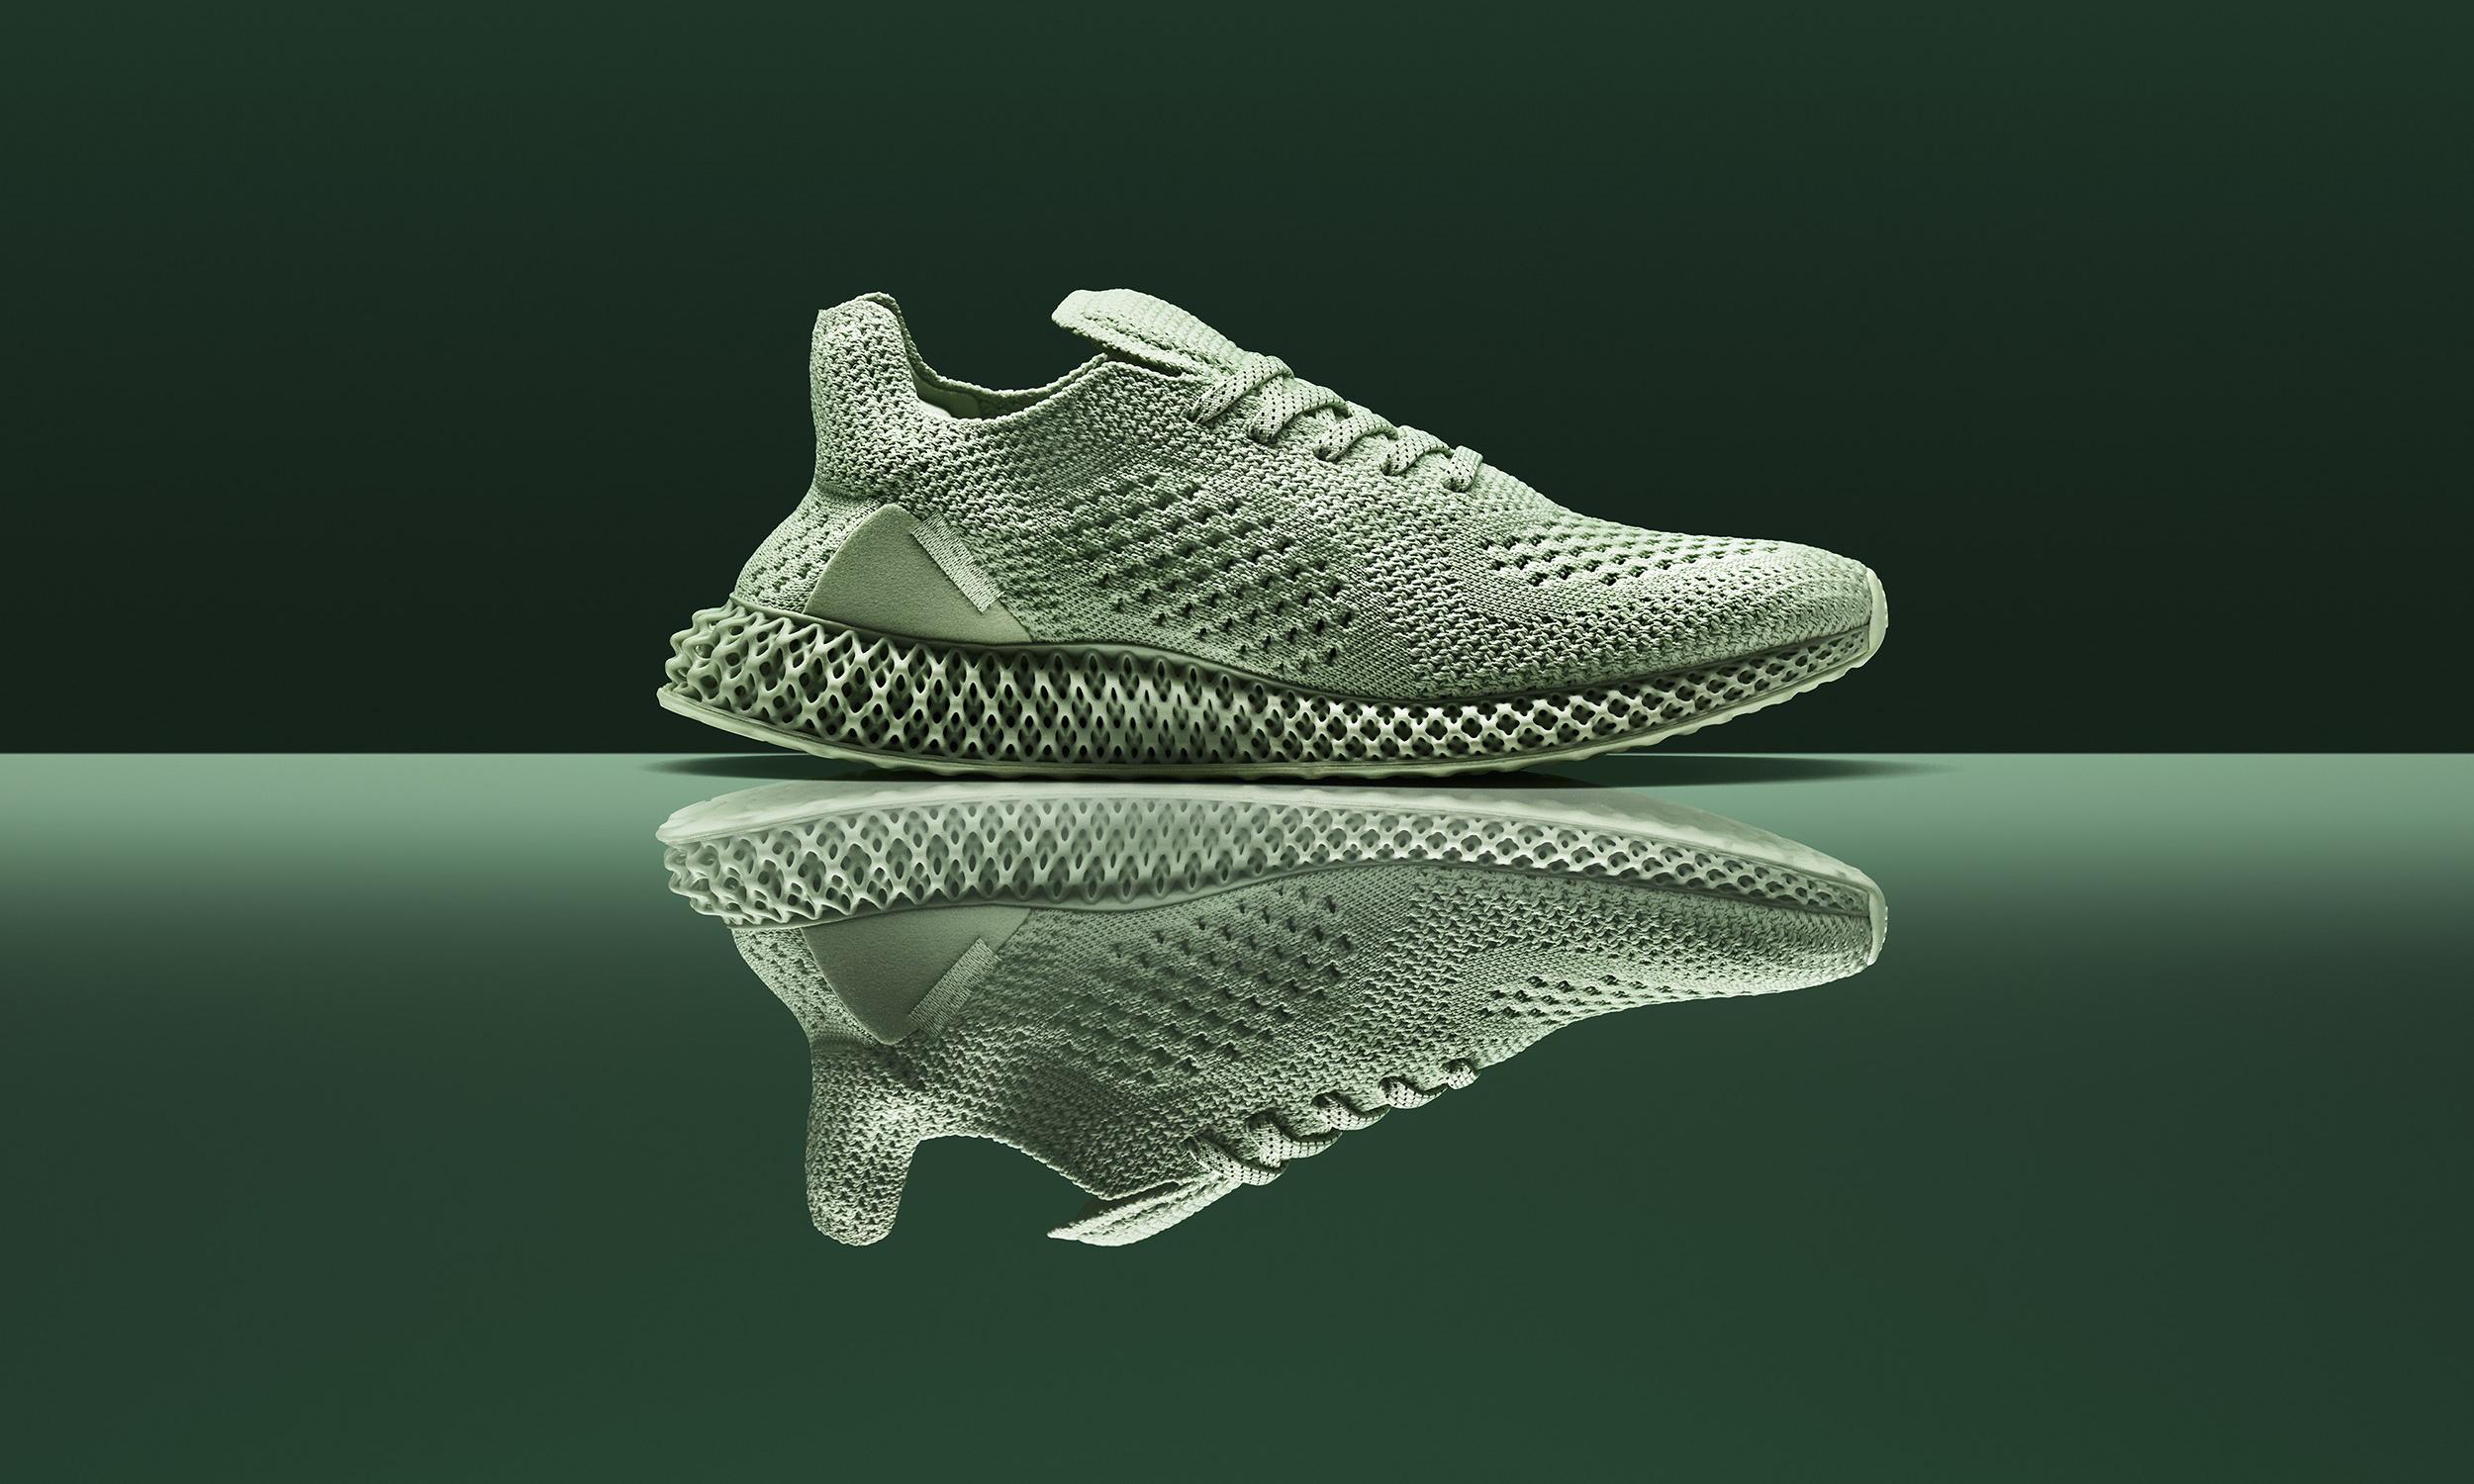 在哪能买到 Daniel Arsham x adidas Futurecraft 4D?